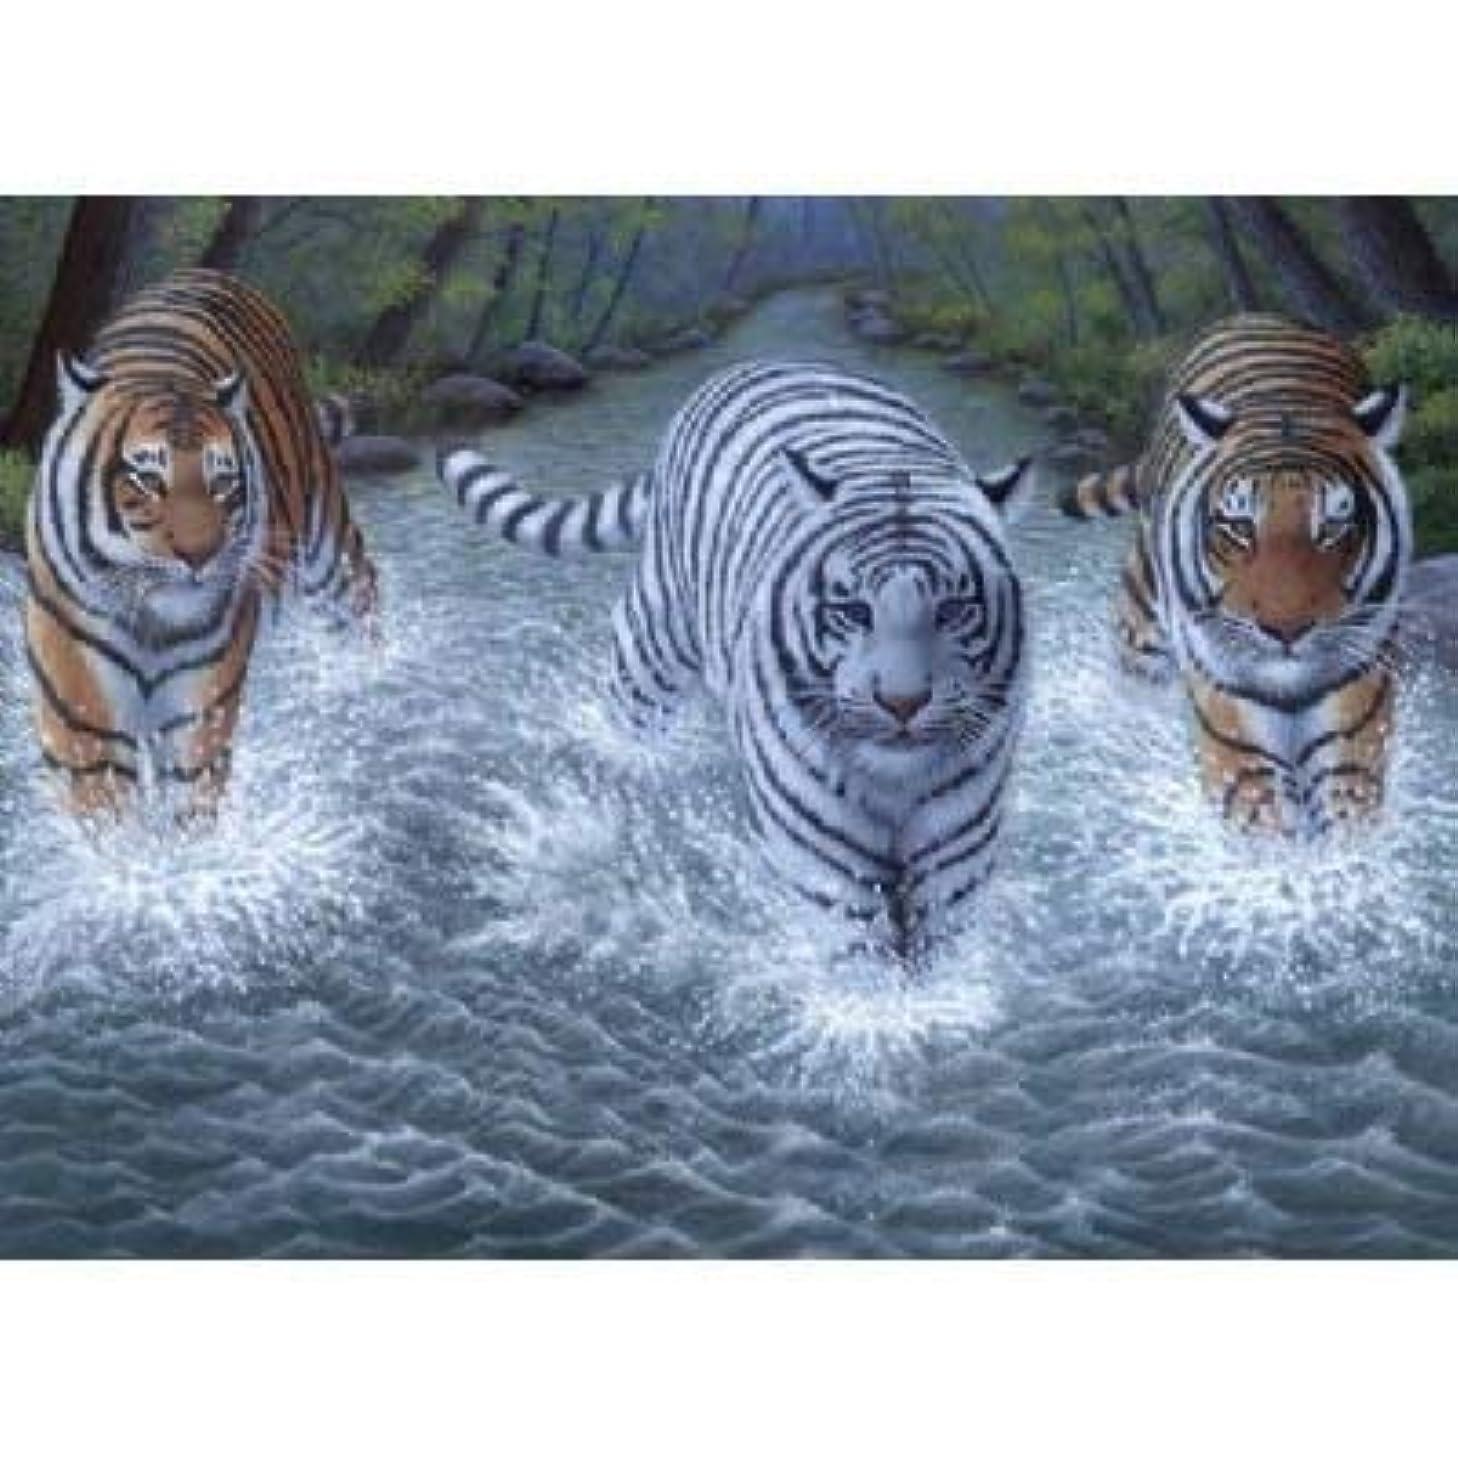 Royal & Langnickel PJL34 11 1/4 x 15 3/8 Junior Large Set Three Tigers